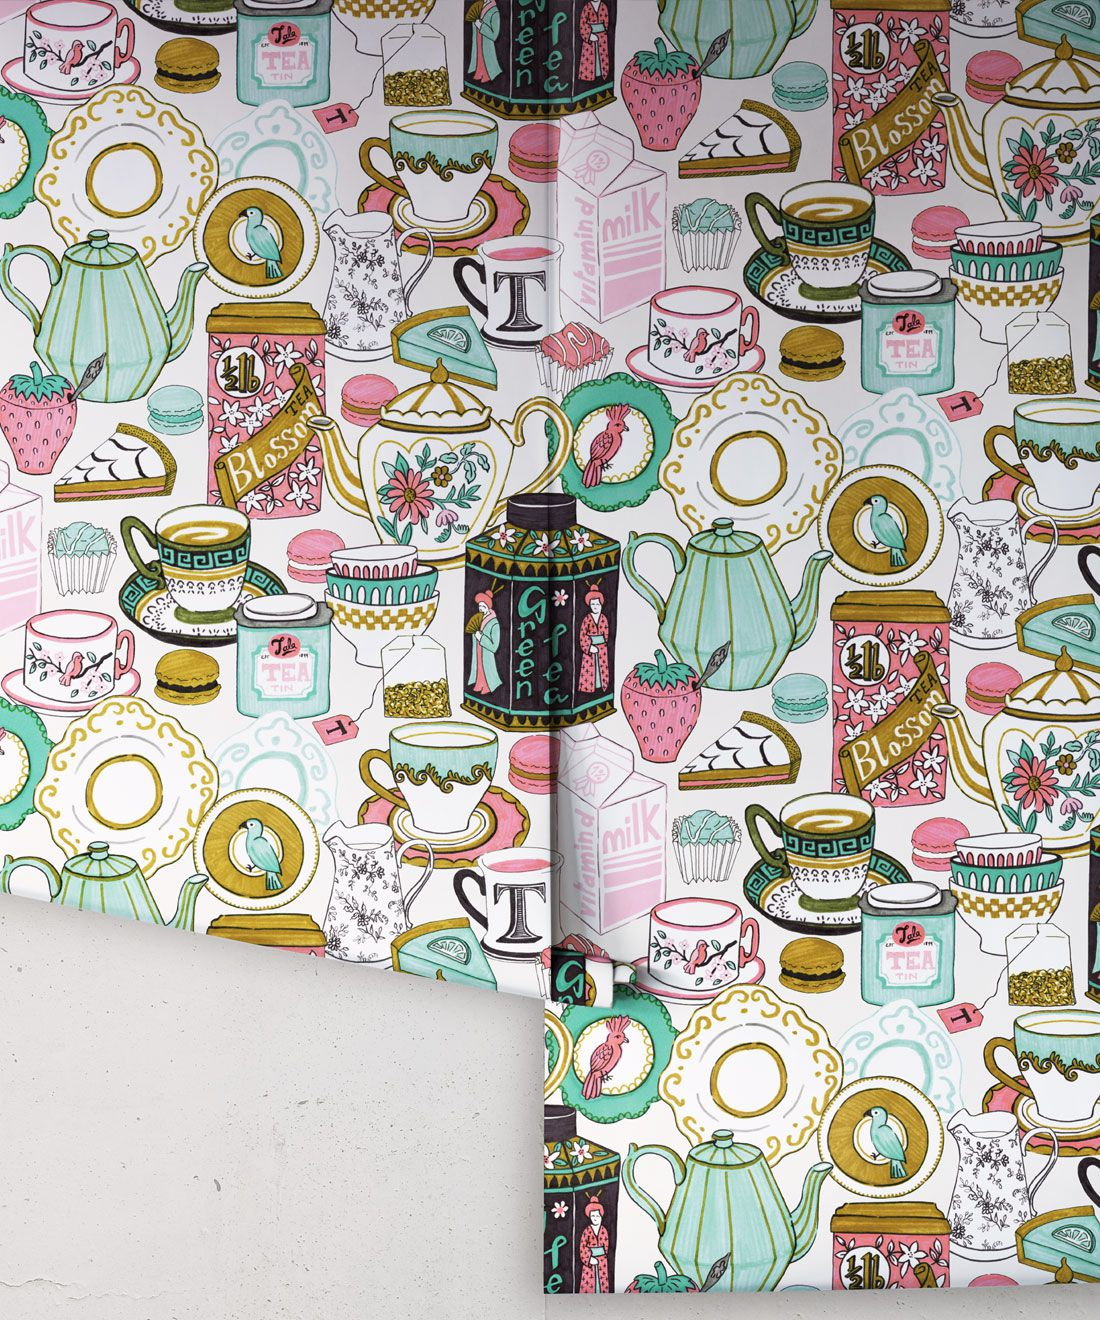 Tea Time Wallpaper • tea cups, tea pots, macaroons • milk and cream rolls